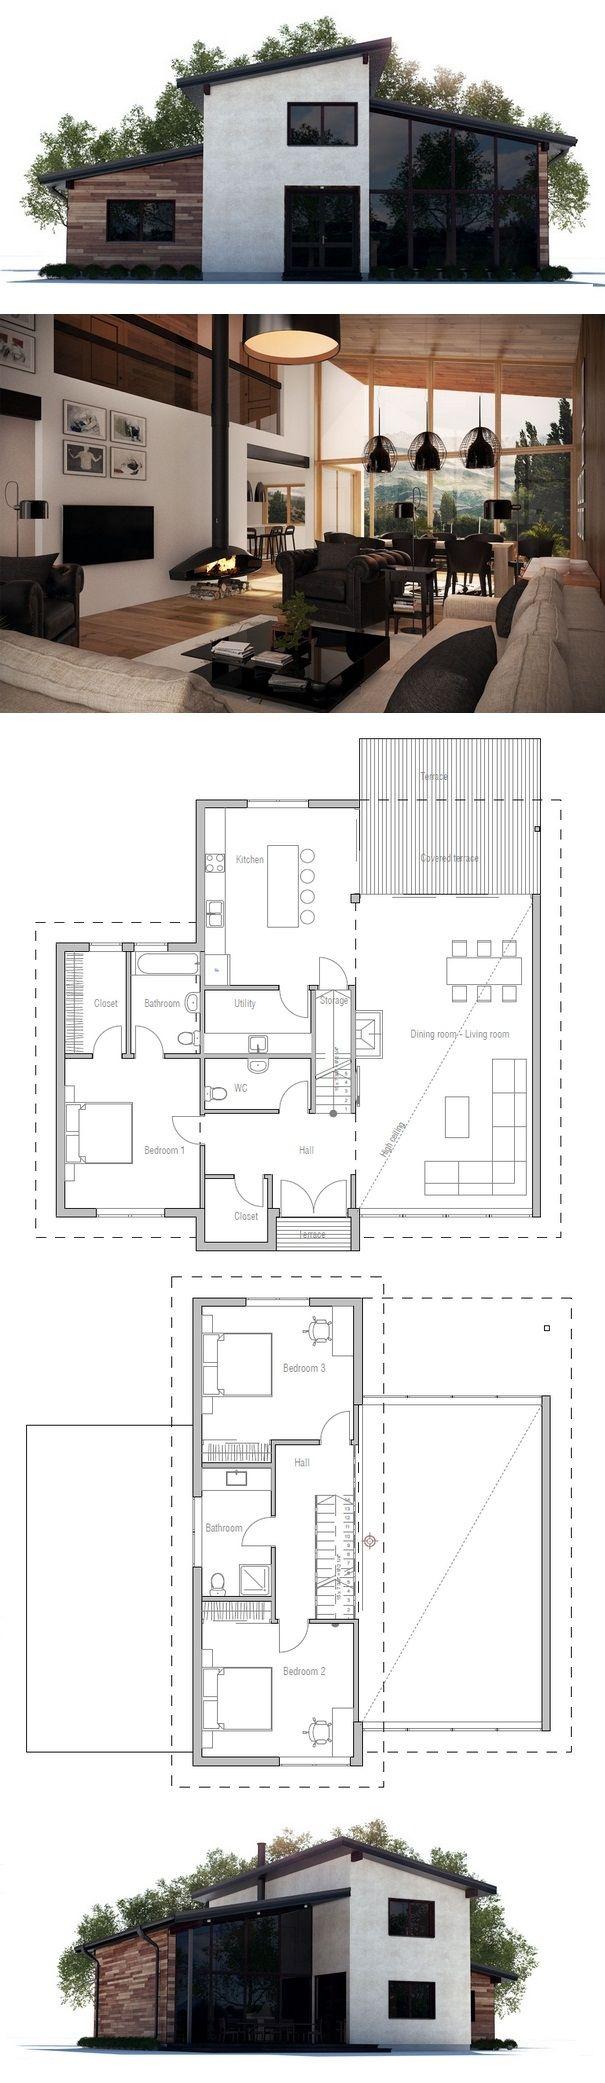 Best 25 Modern House Plans Ideas On Pinterest Modern House